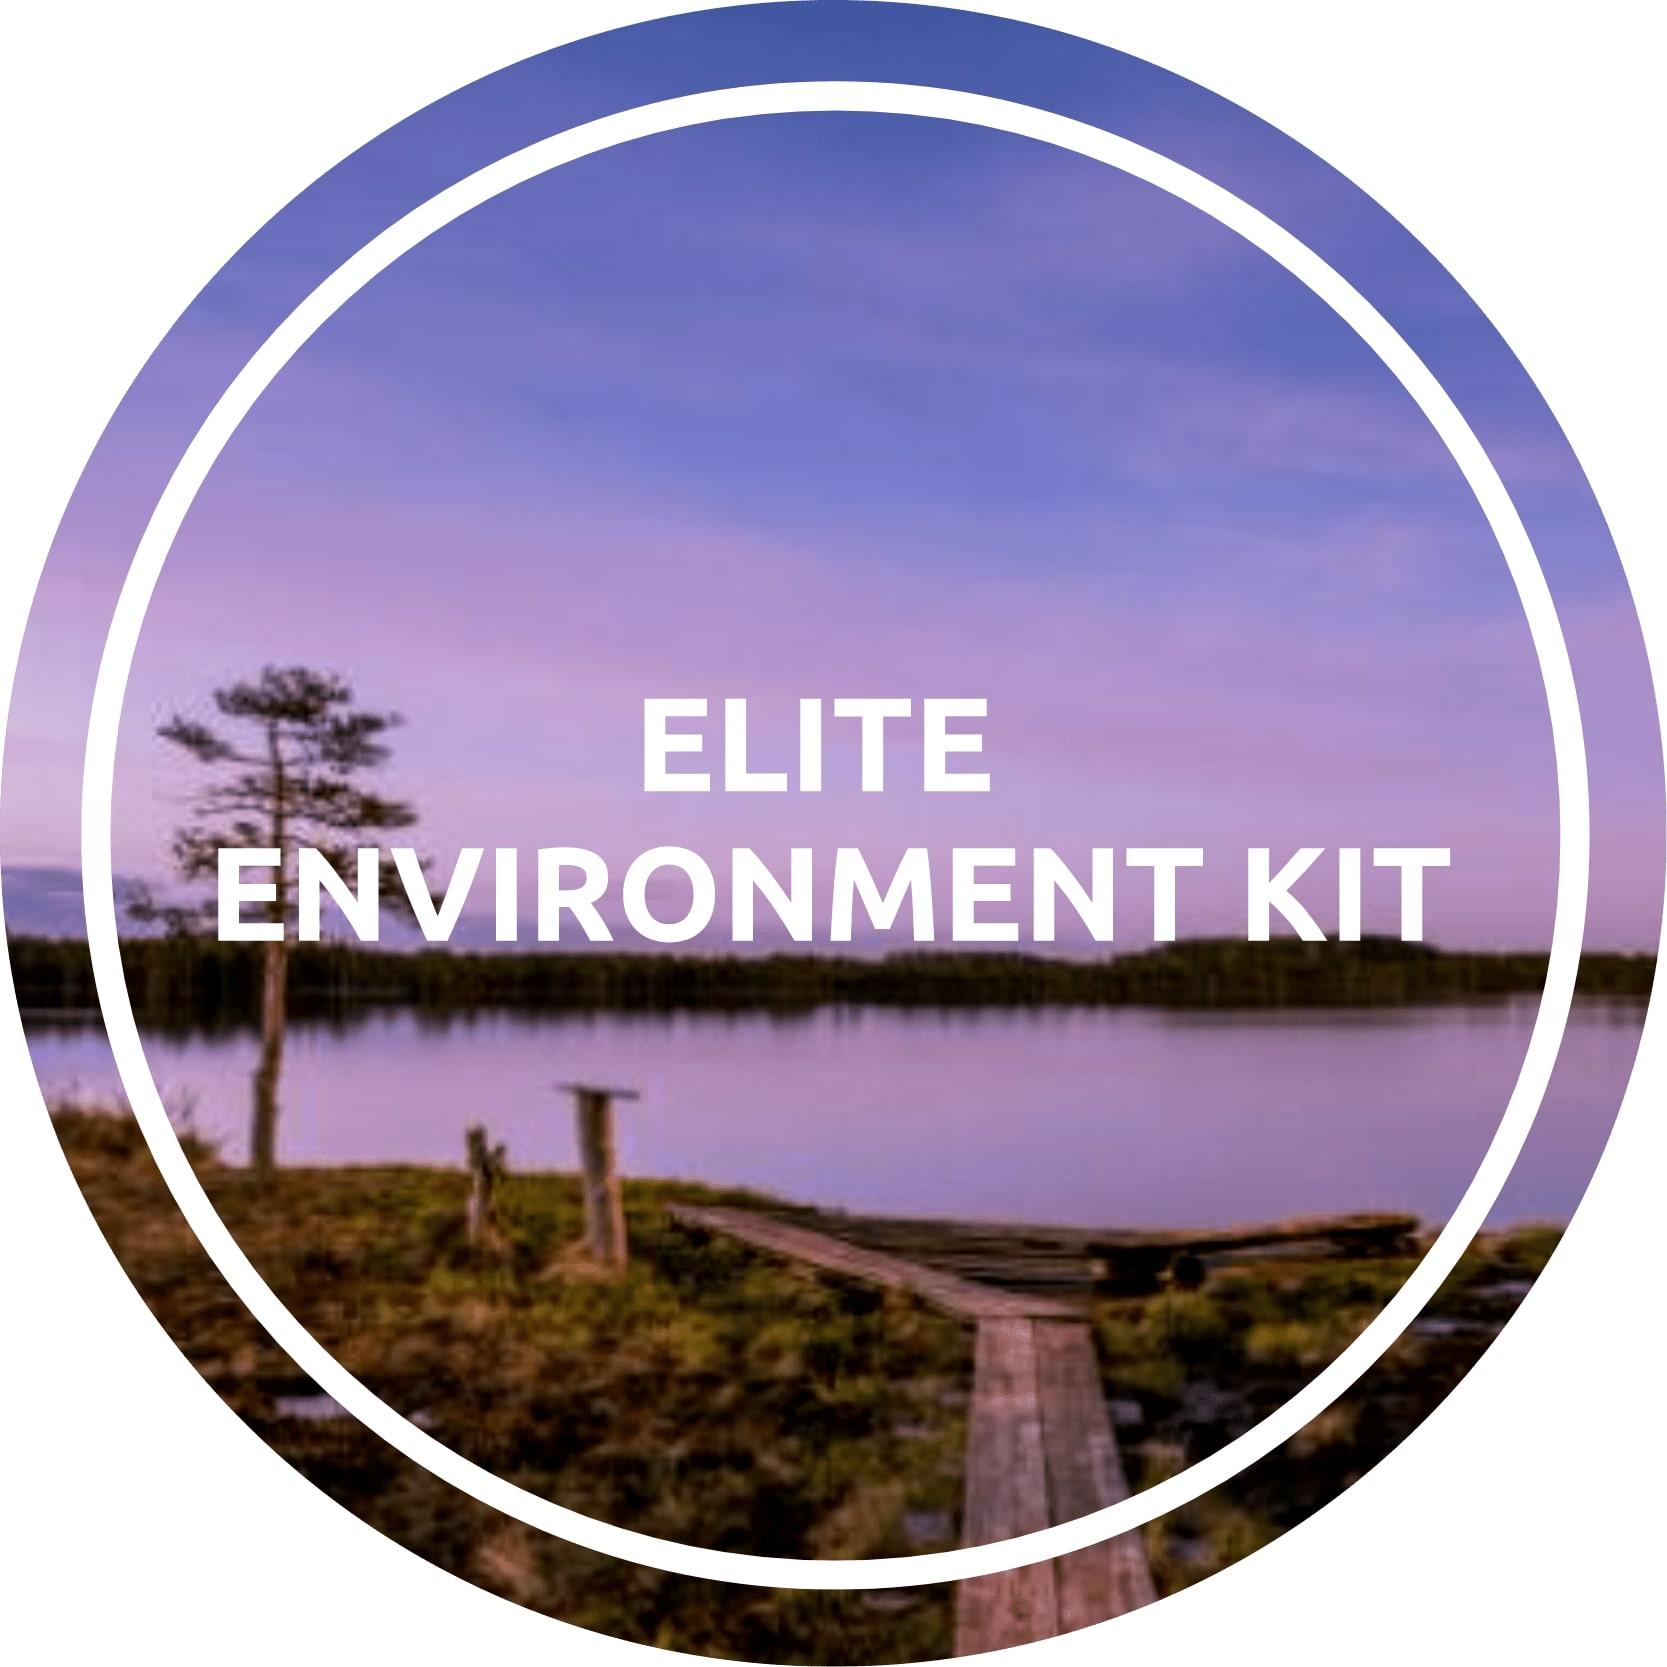 L'Elite Environment kit include BLE-B, ENV, PRT, RHT, UVA, SMS, IB3, IB2, PCB, RPS e FIX con housing